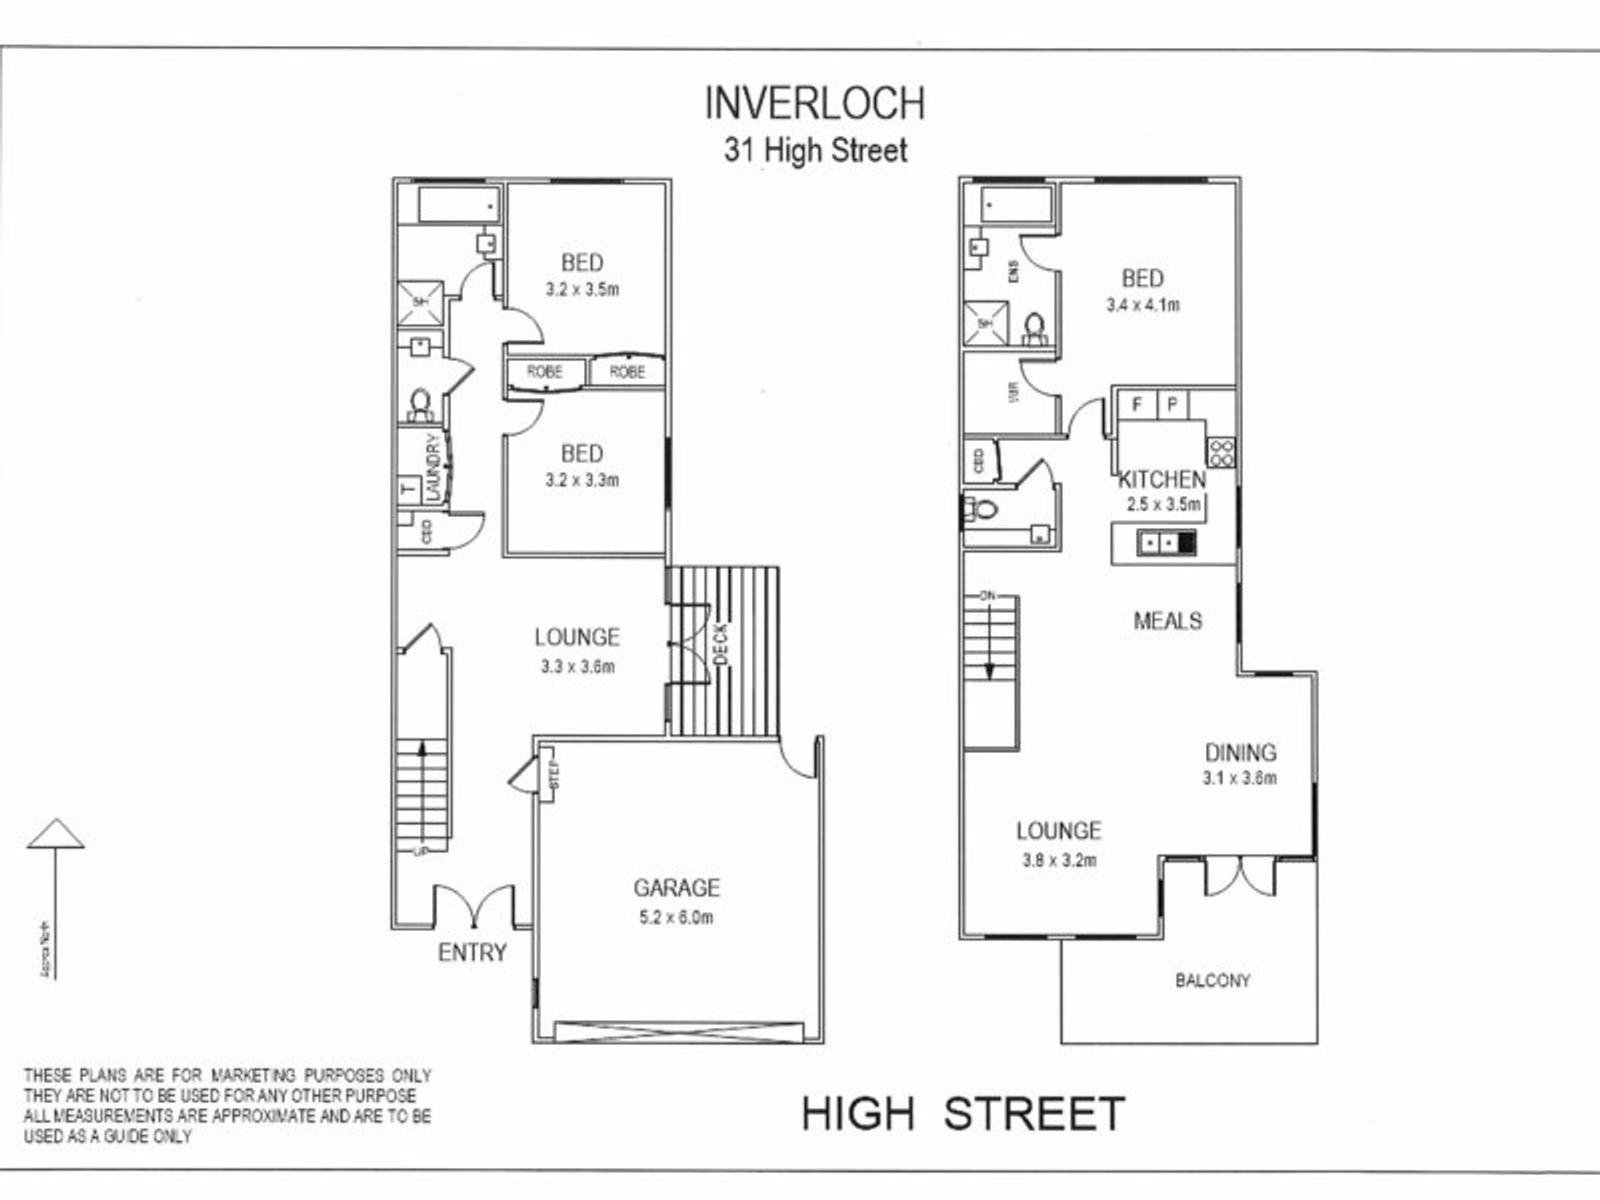 31 High Street, Inverloch, VIC 3996